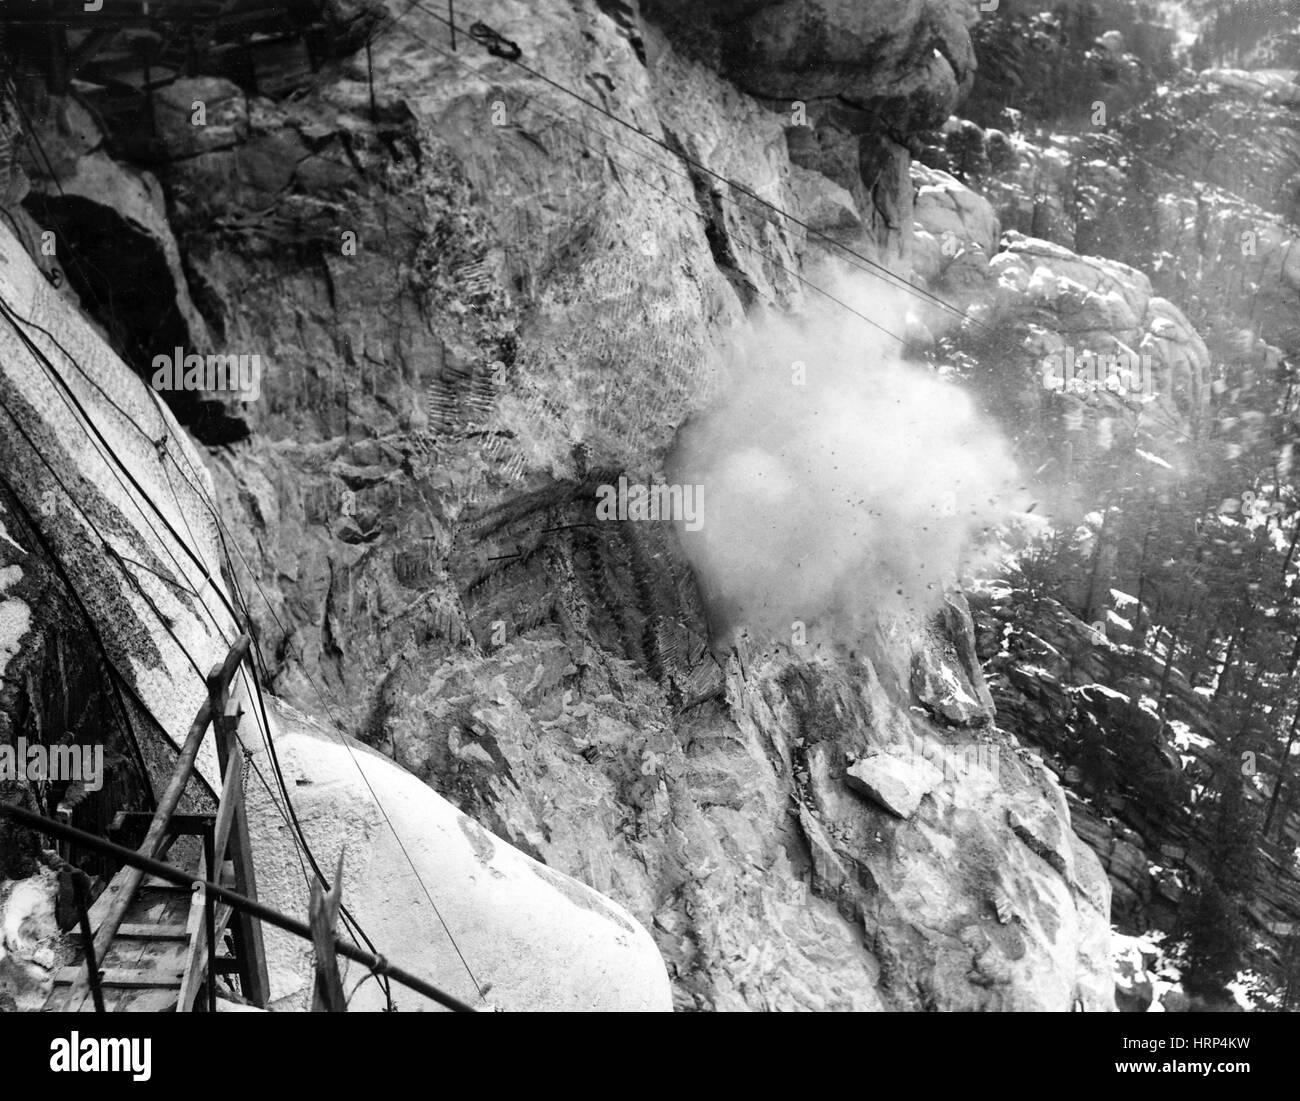 Blasting Rock on Mount Rushmore, 1930s - Stock Image